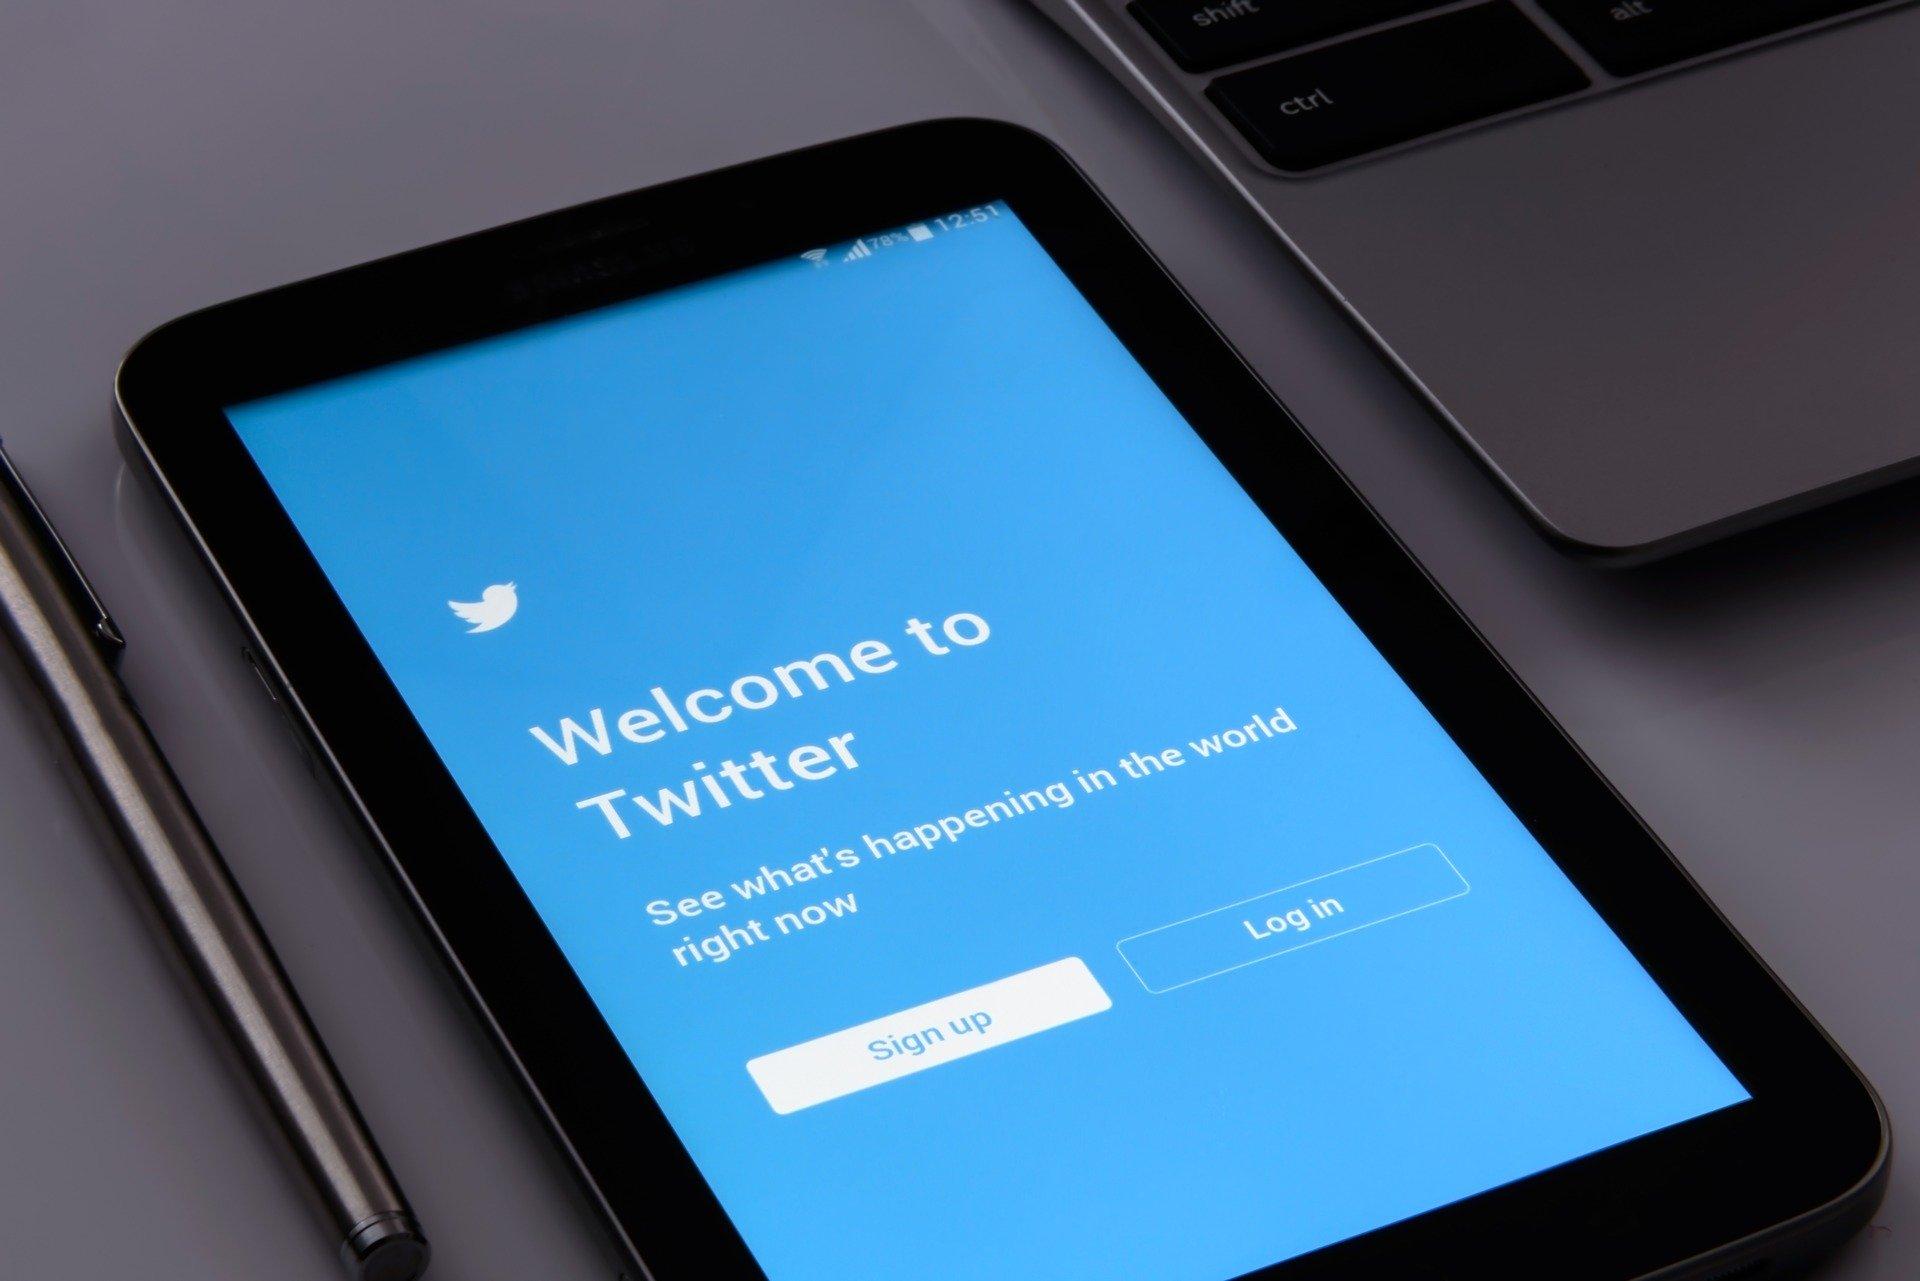 Twitterを見るだけでも価値あり!旬の情報を探す方法